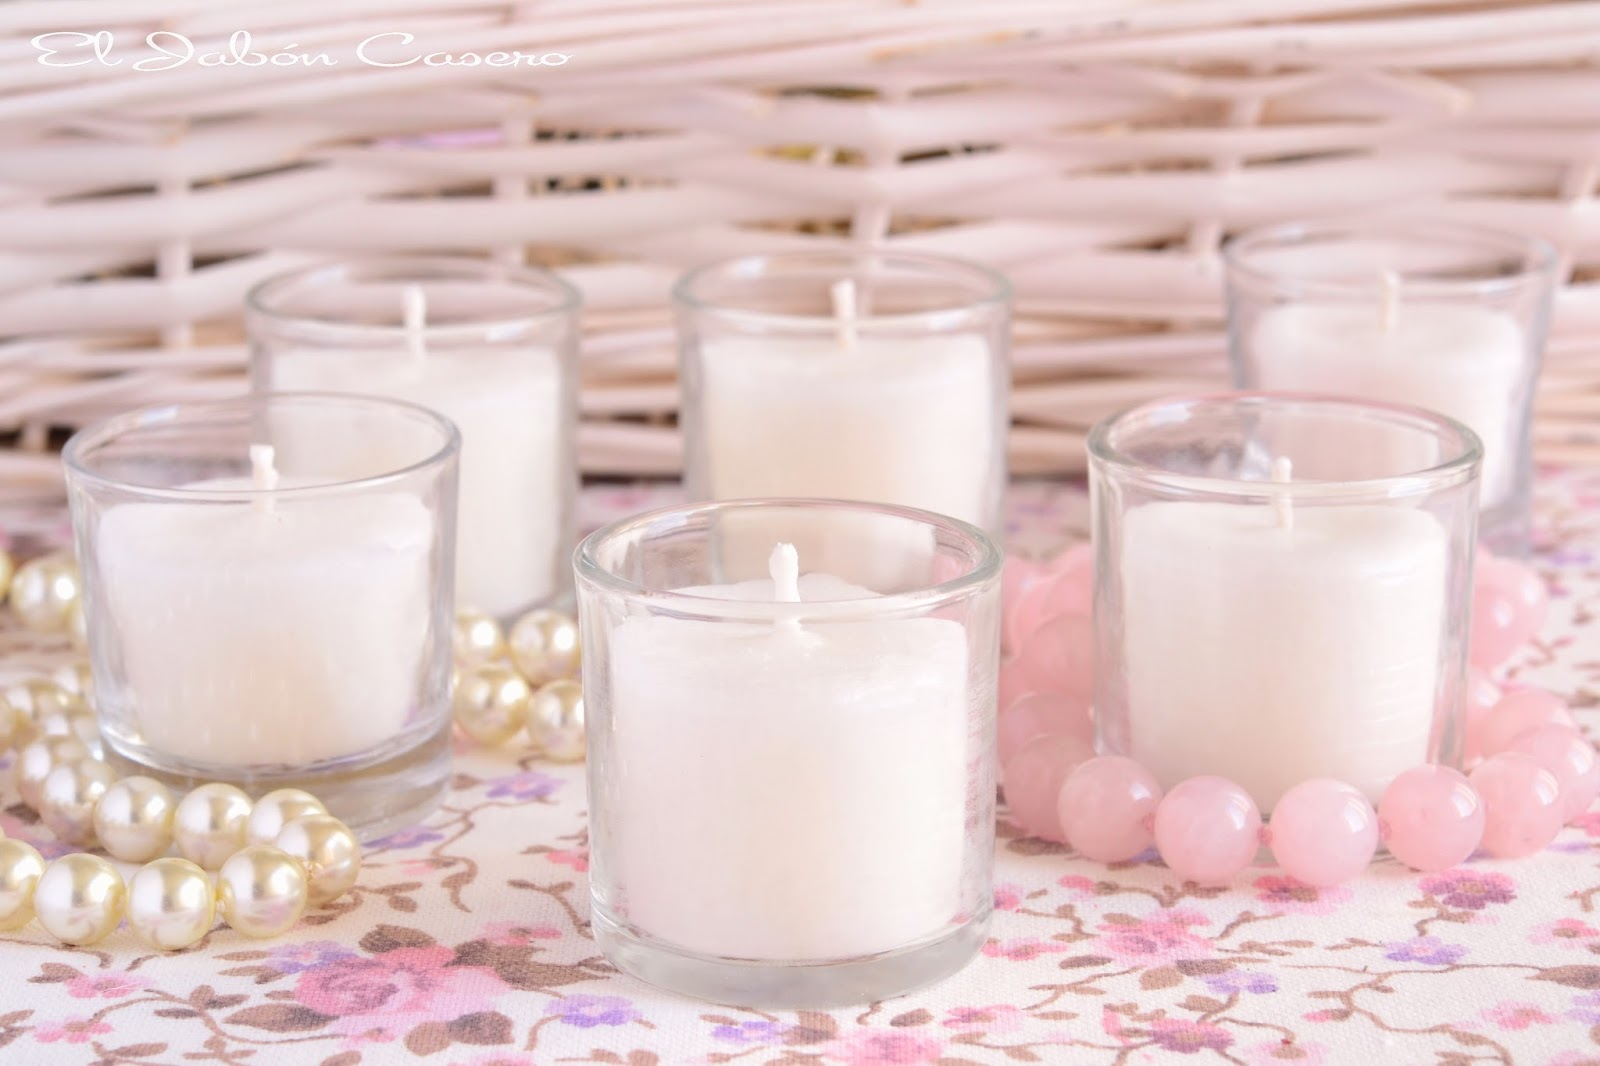 detalles para bodas velas de cera natural